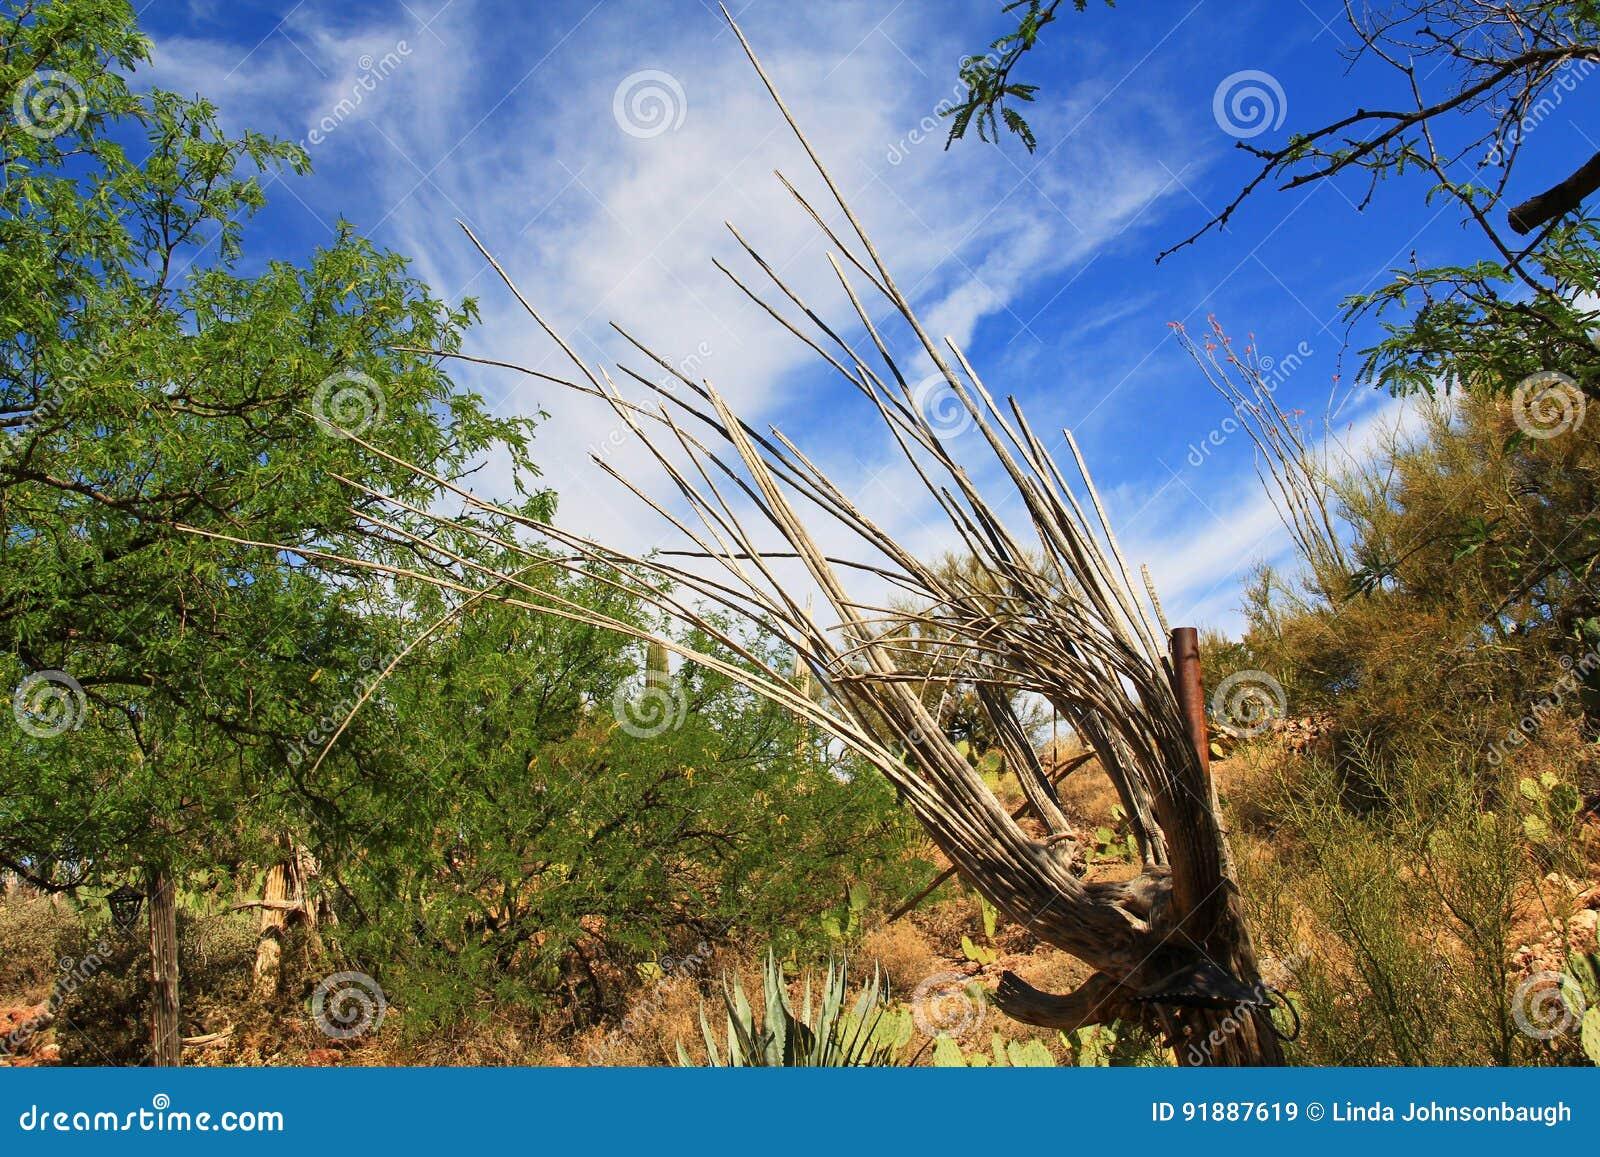 nervures en bois d 39 un cactus mort de saguaro image stock image 91887619. Black Bedroom Furniture Sets. Home Design Ideas